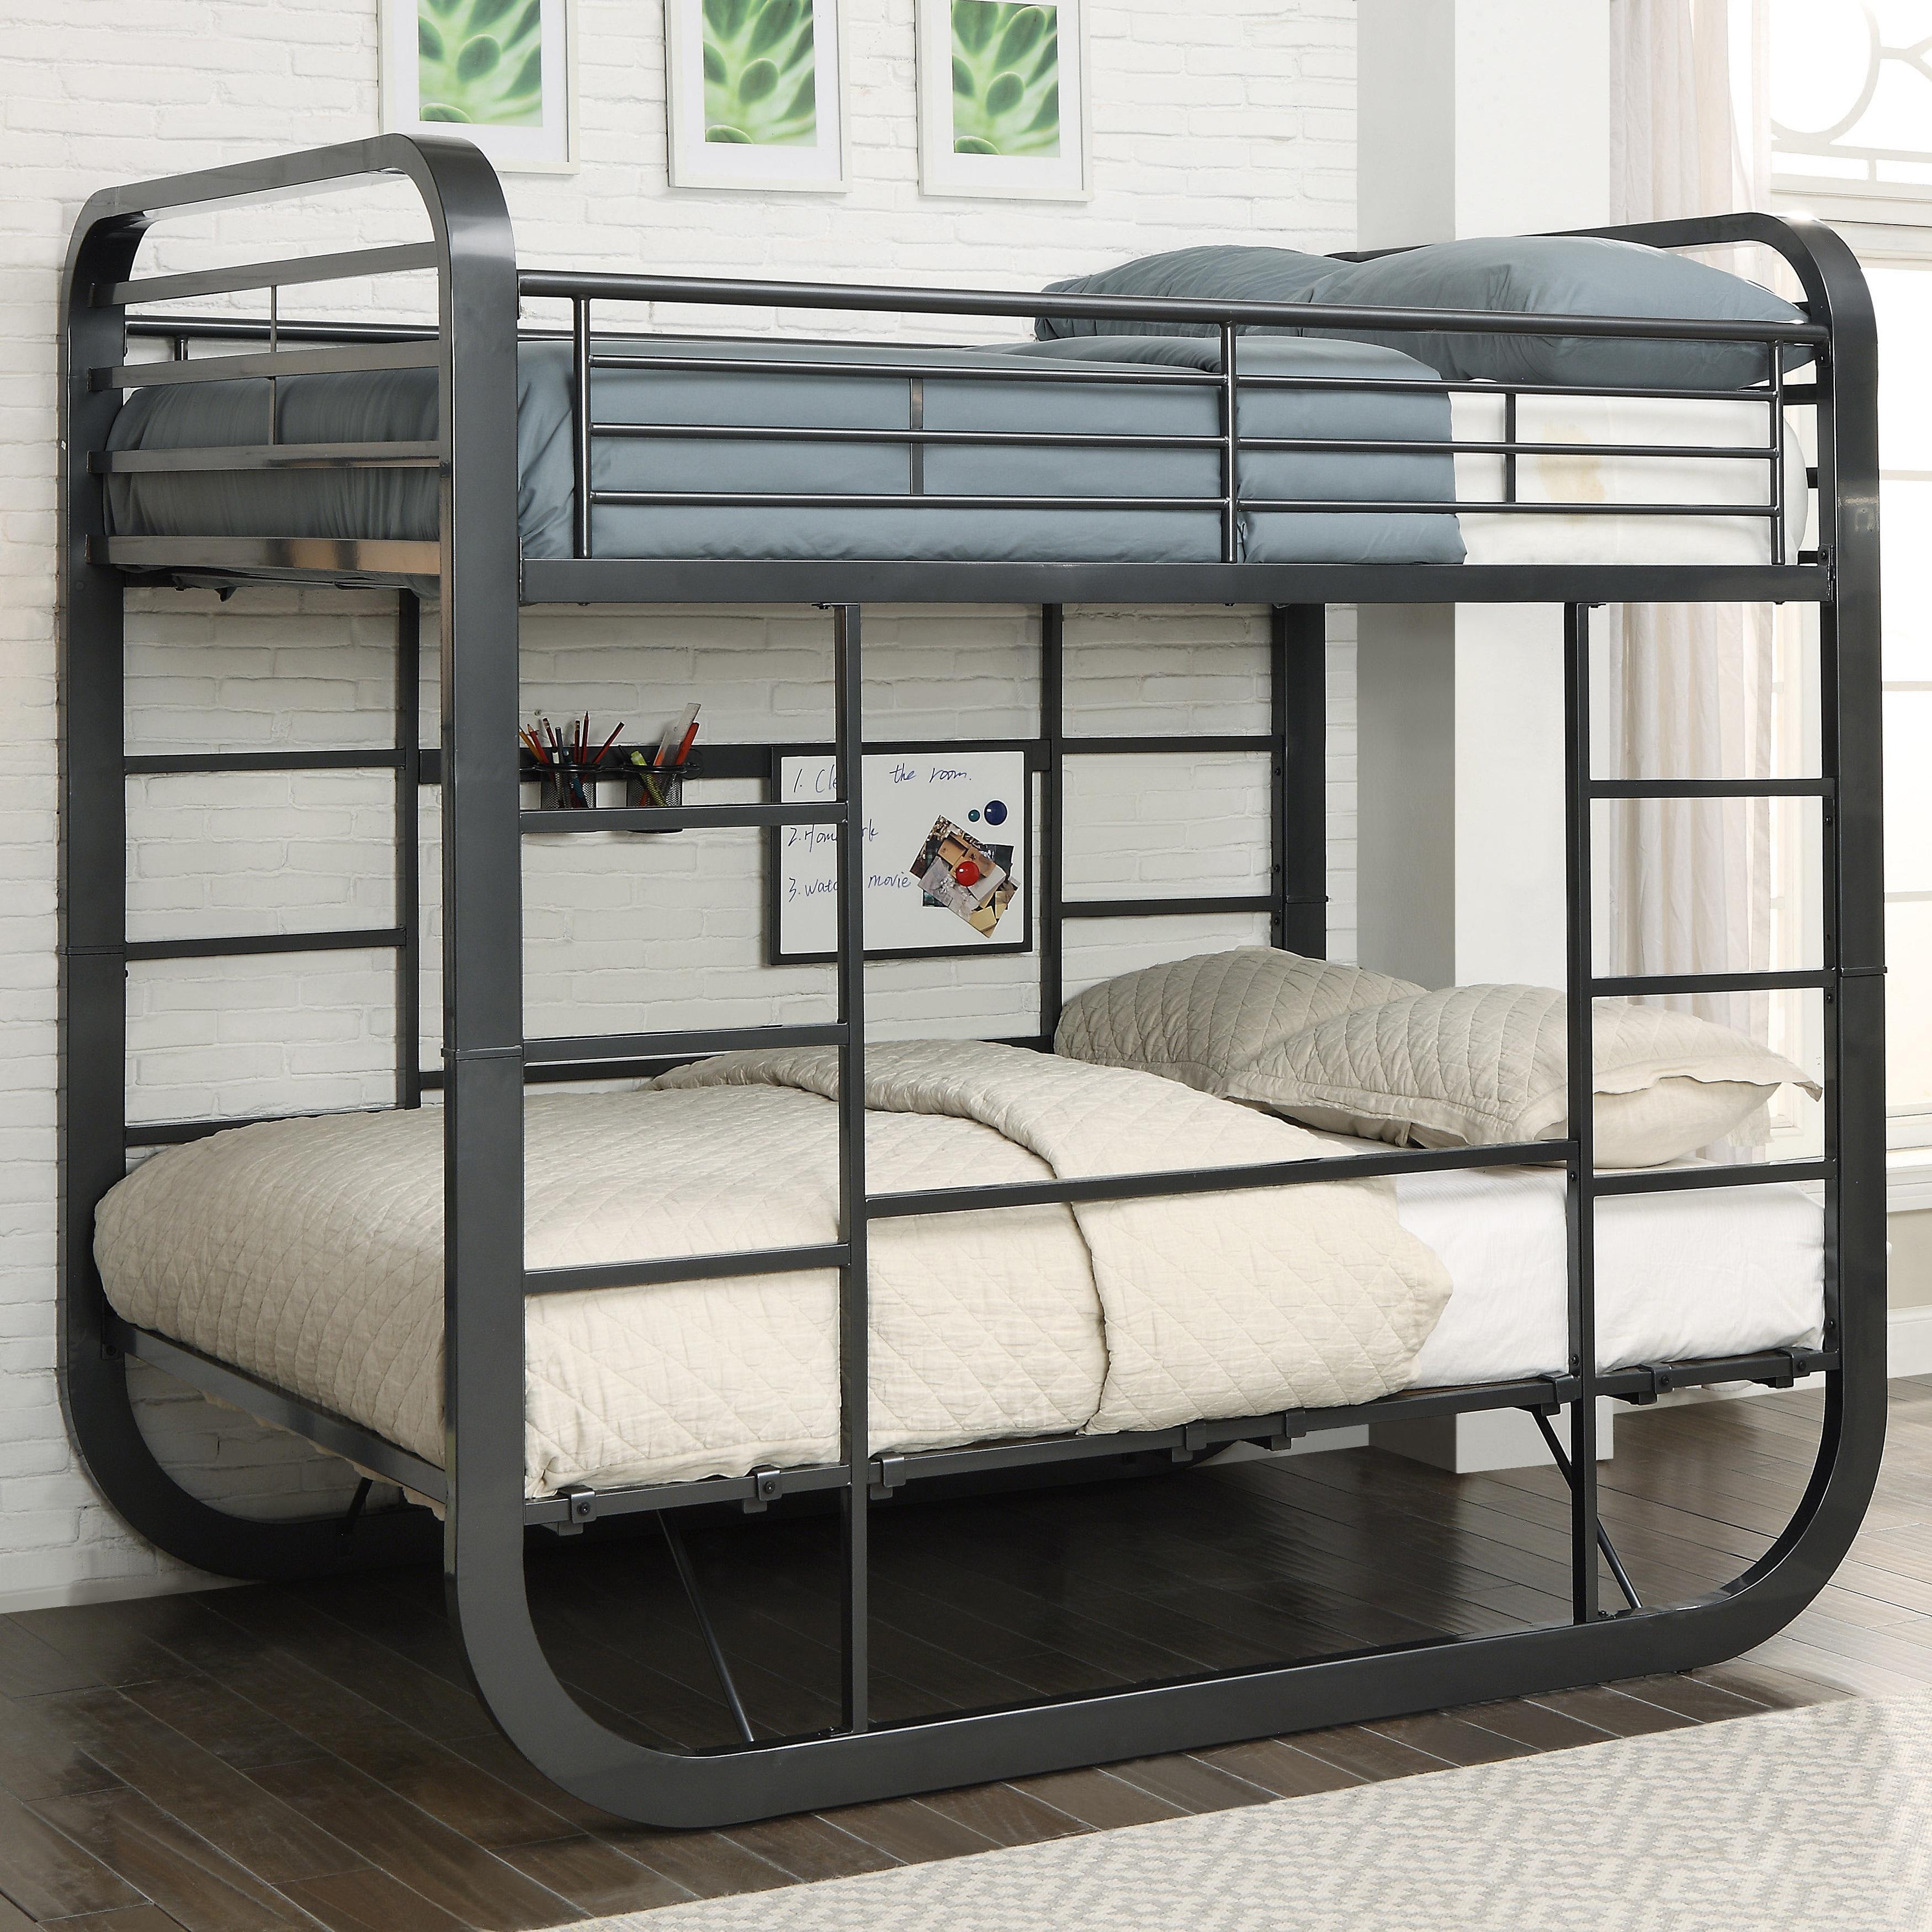 Furniture of America Ulsa Contemporary Convertible Metal ...